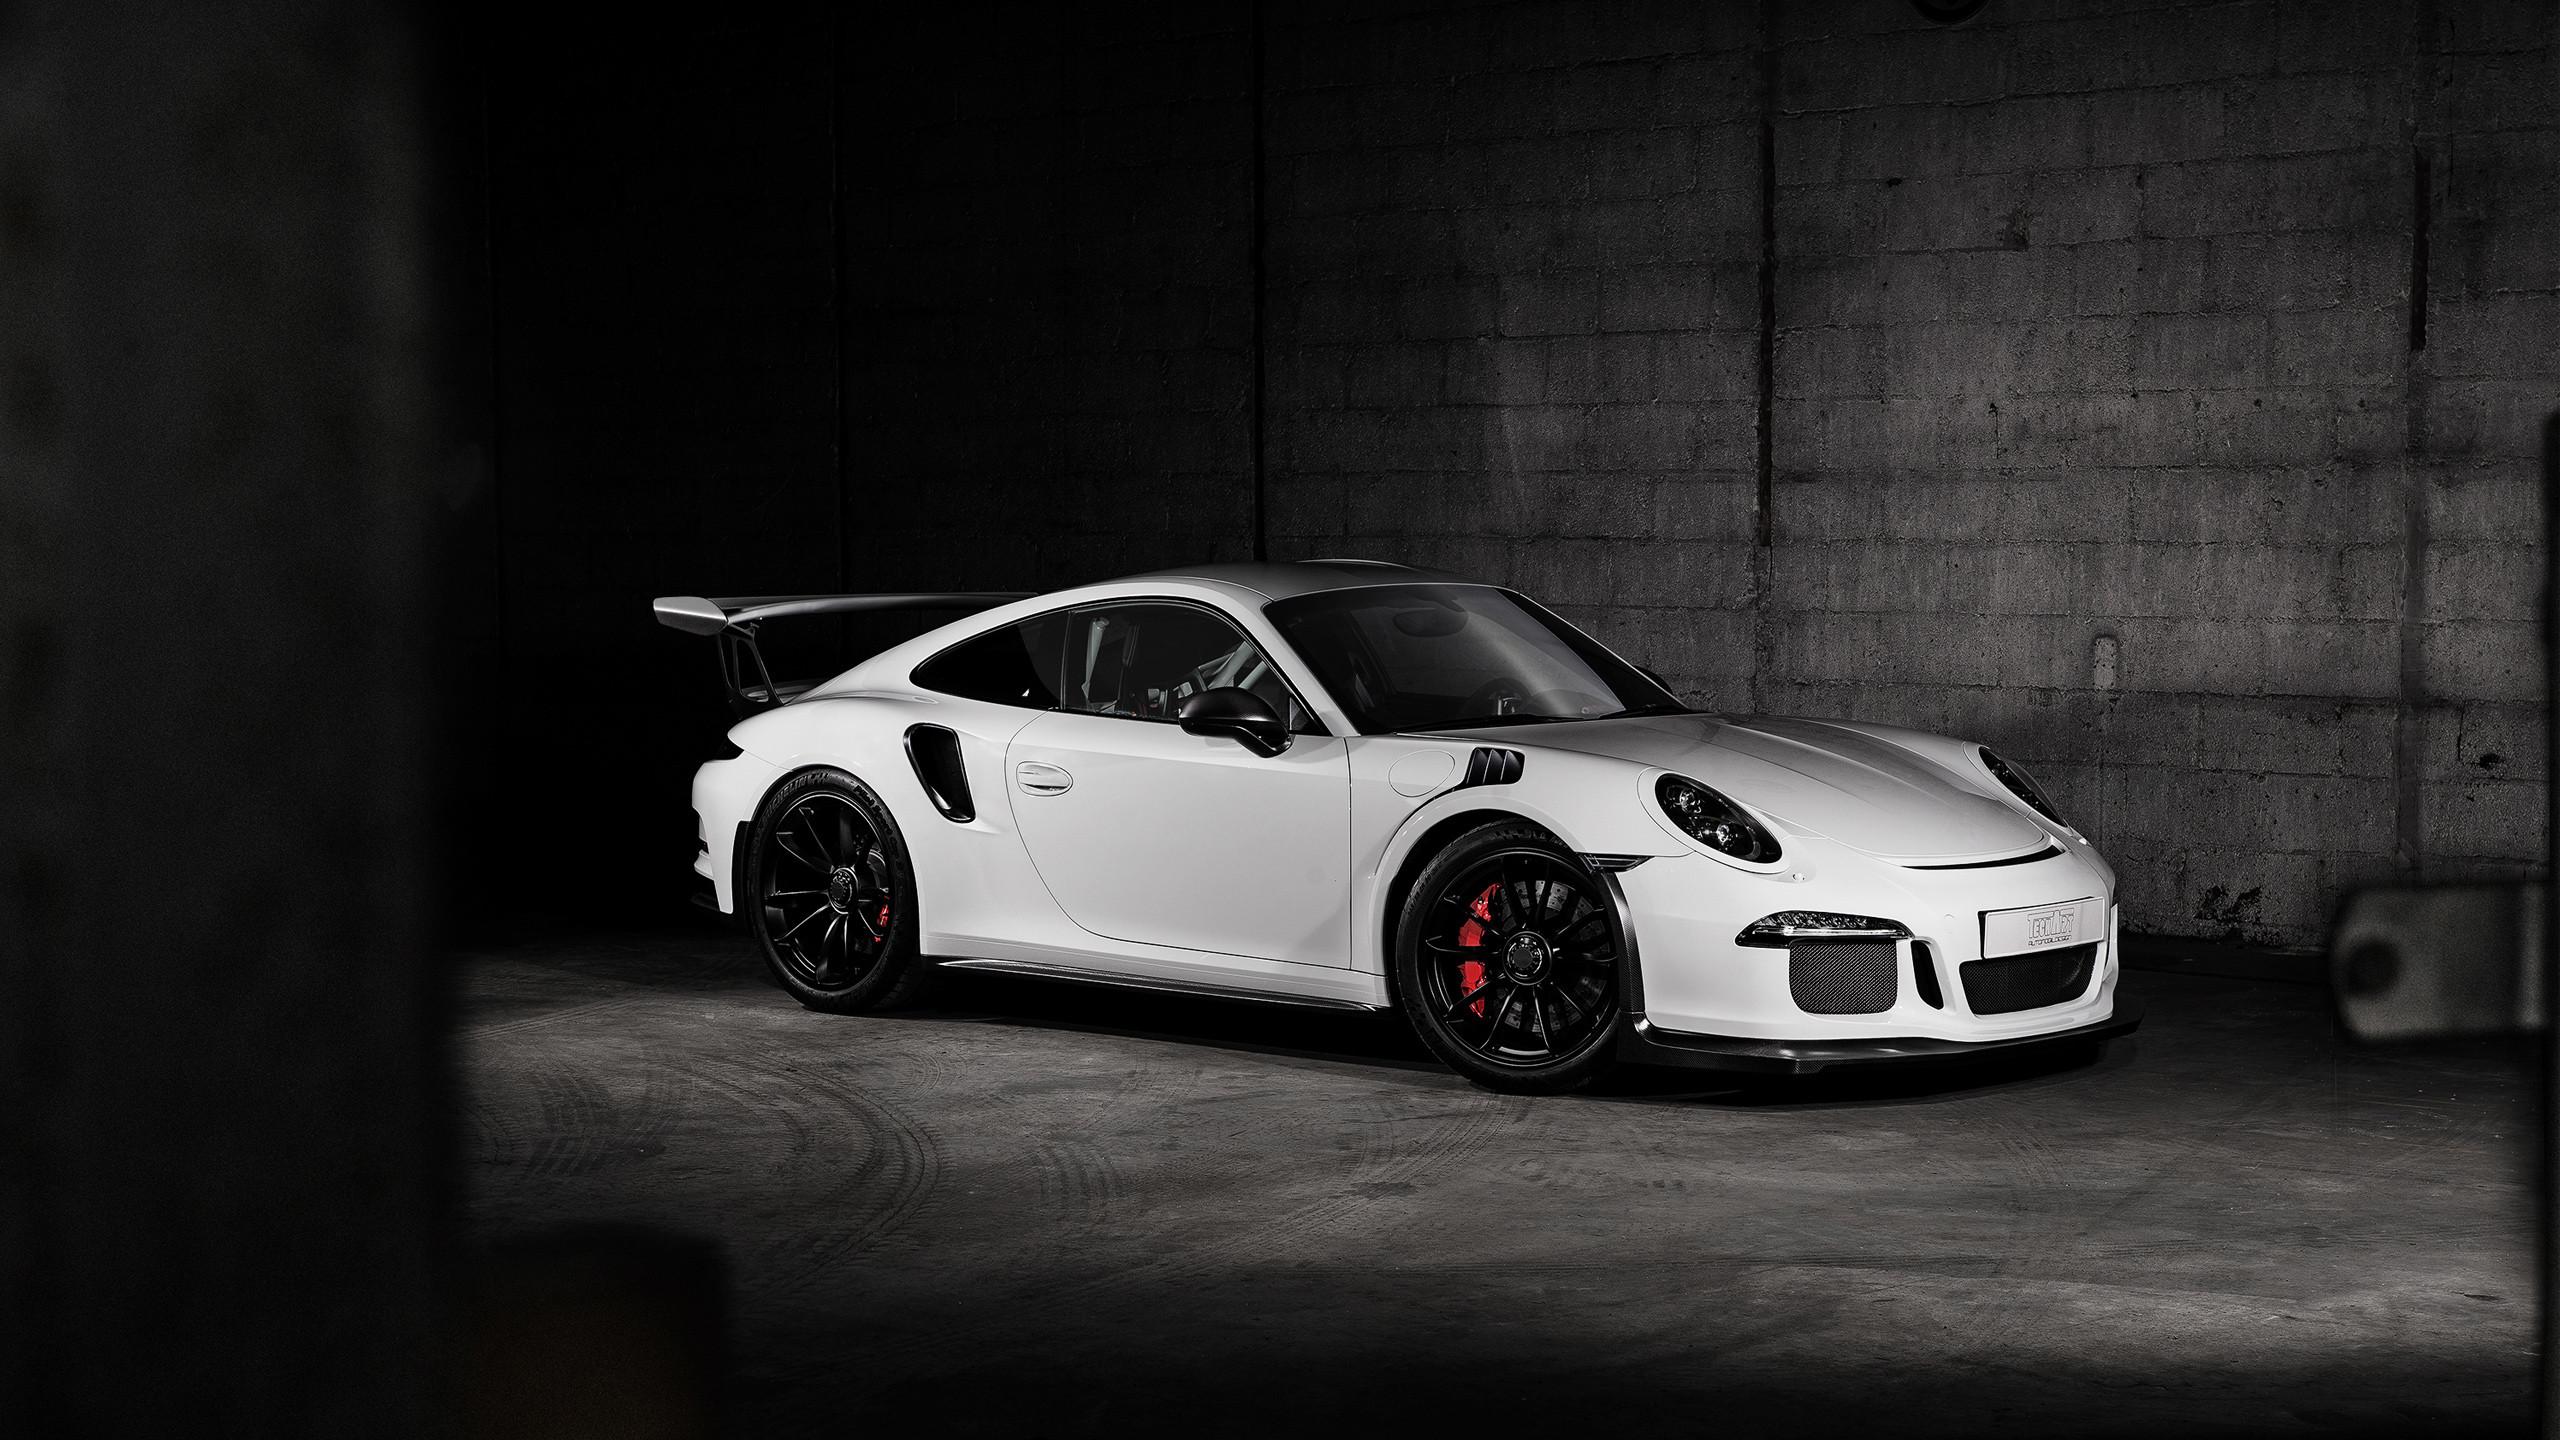 Porsche 911 Gt3 Rs Wallpaper 71 Pictures